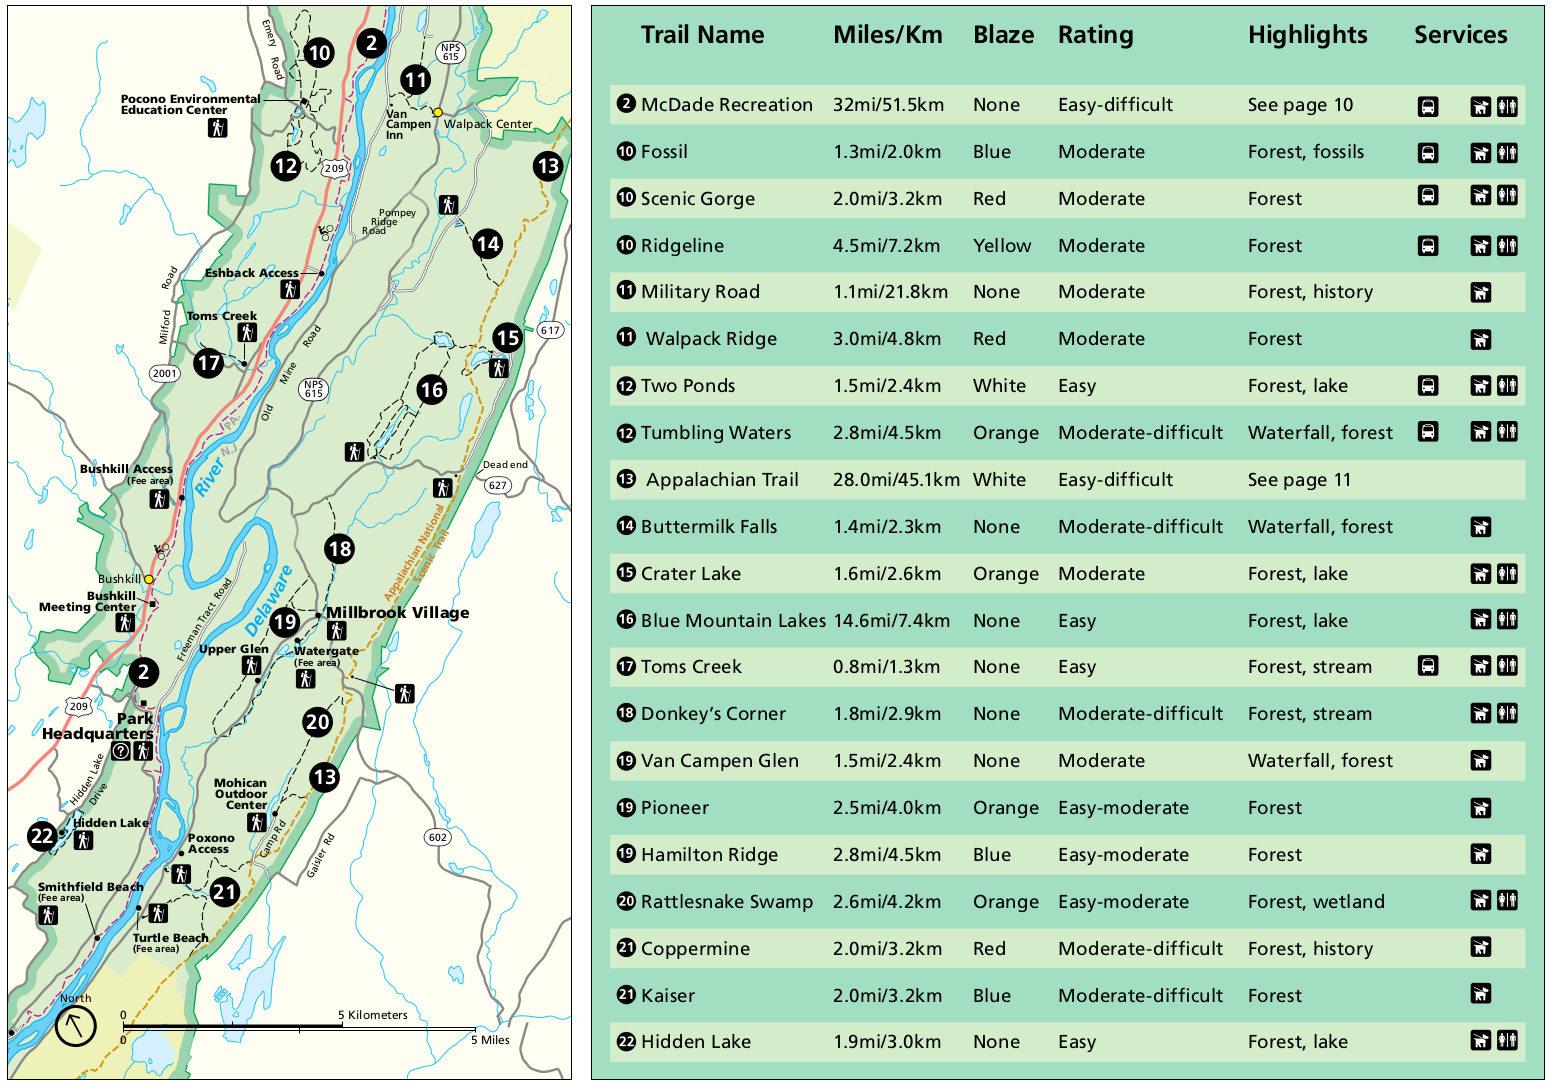 Delaware Water Gap Maps Npmaps Com Just Free Maps Period